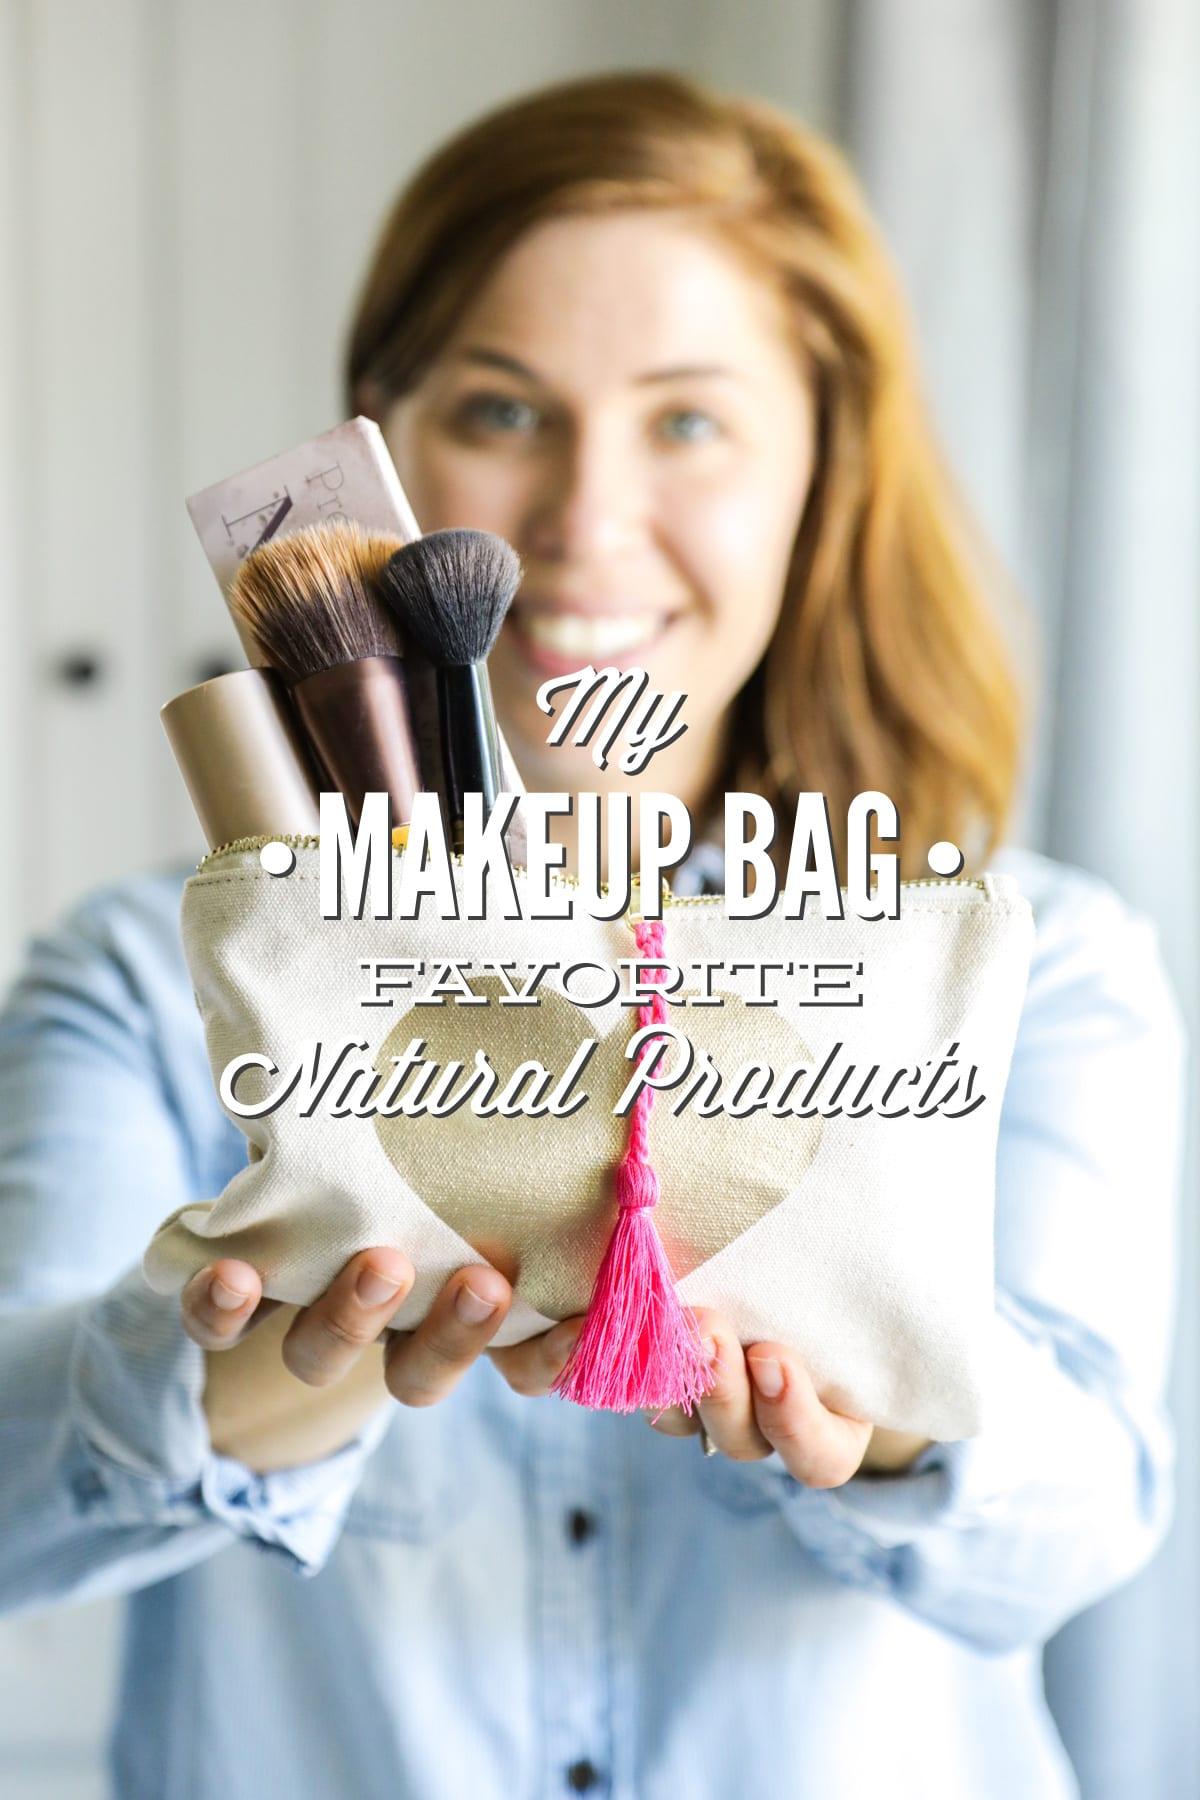 My Makeup Bag: Favorite Natural Products